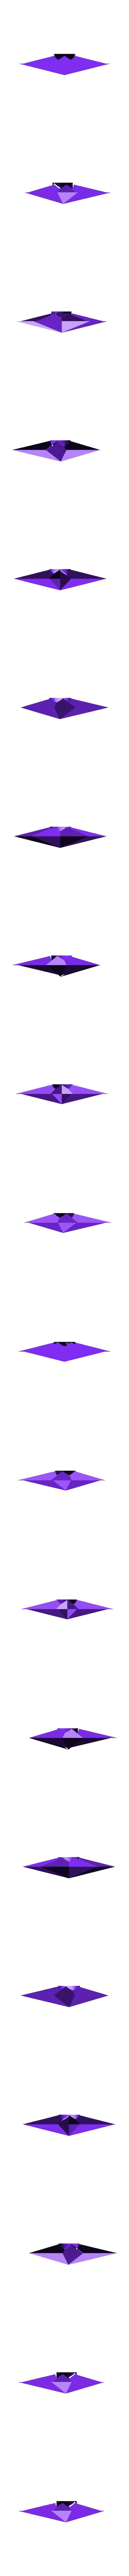 Star1.stl Download free STL file Stars • 3D print design, omni-moulage